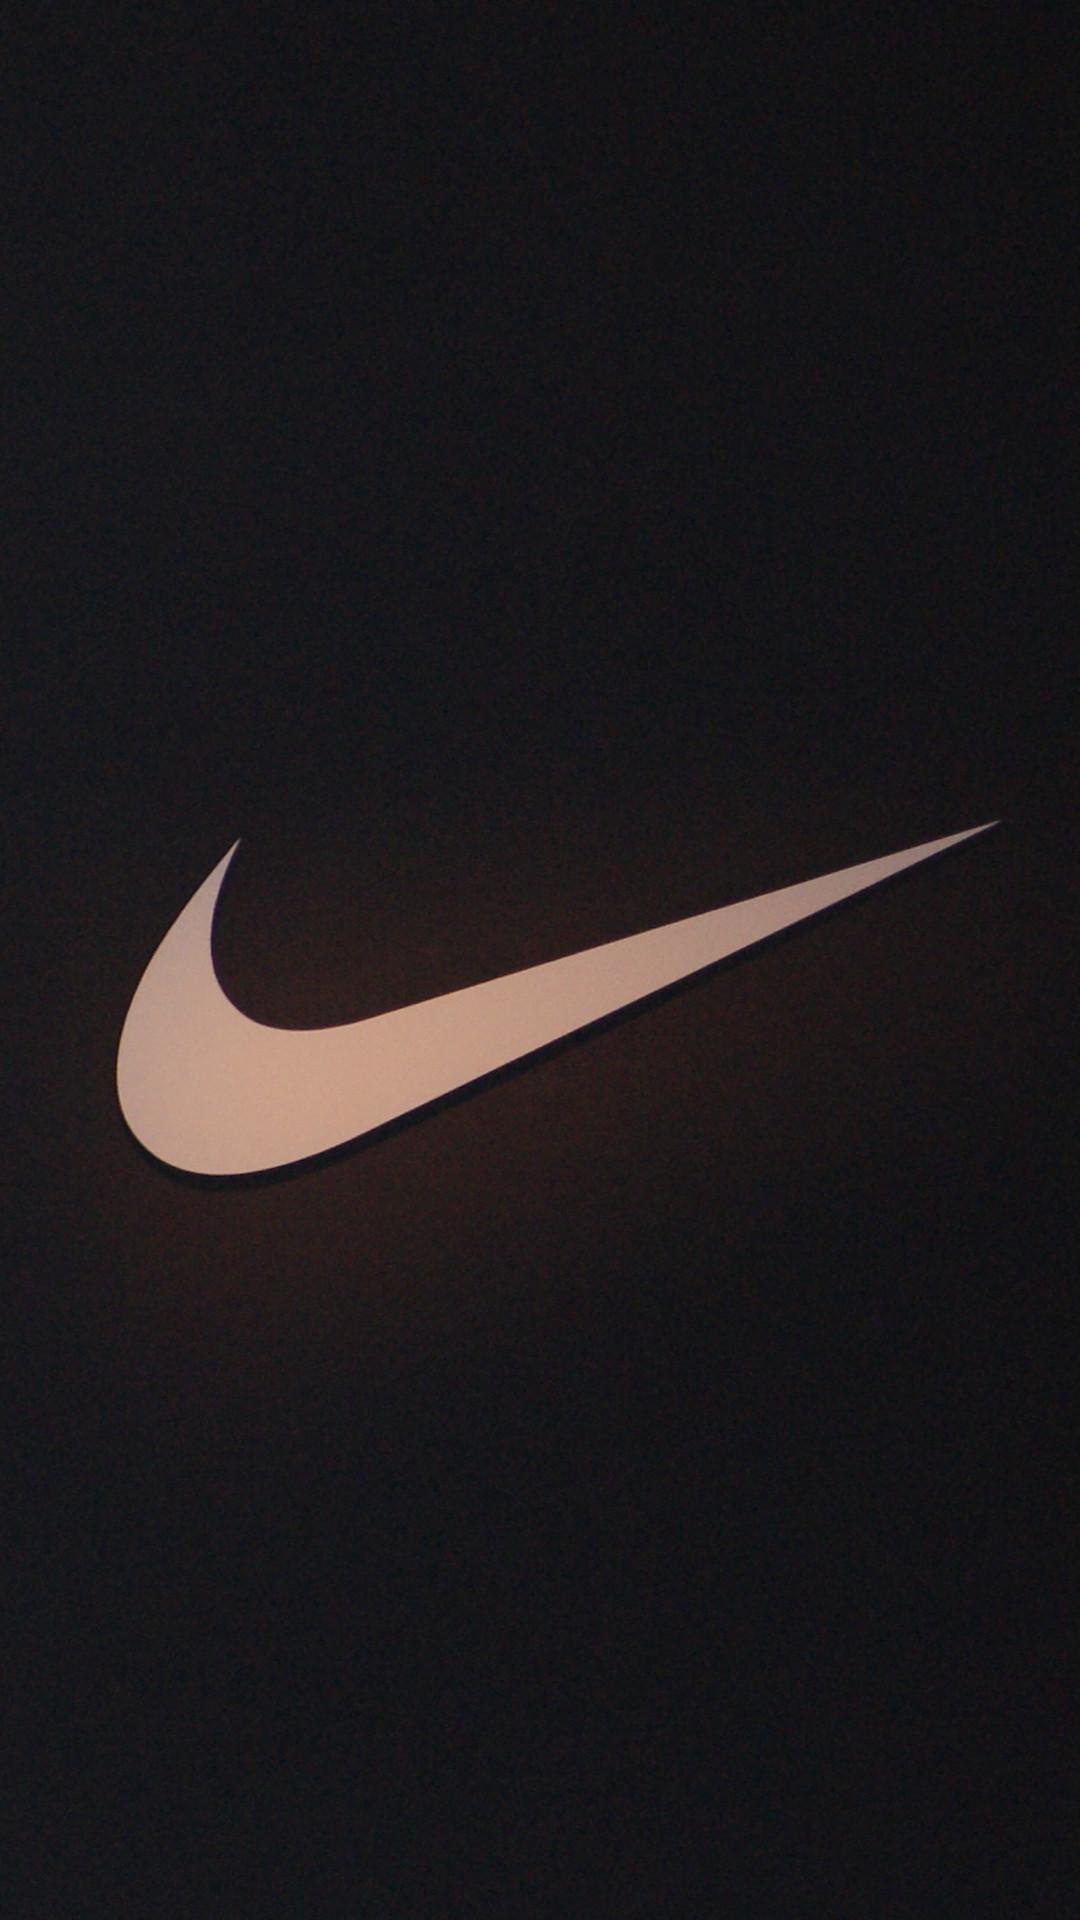 Nike Phone Backgrounds Nike logo htc one wallpaper